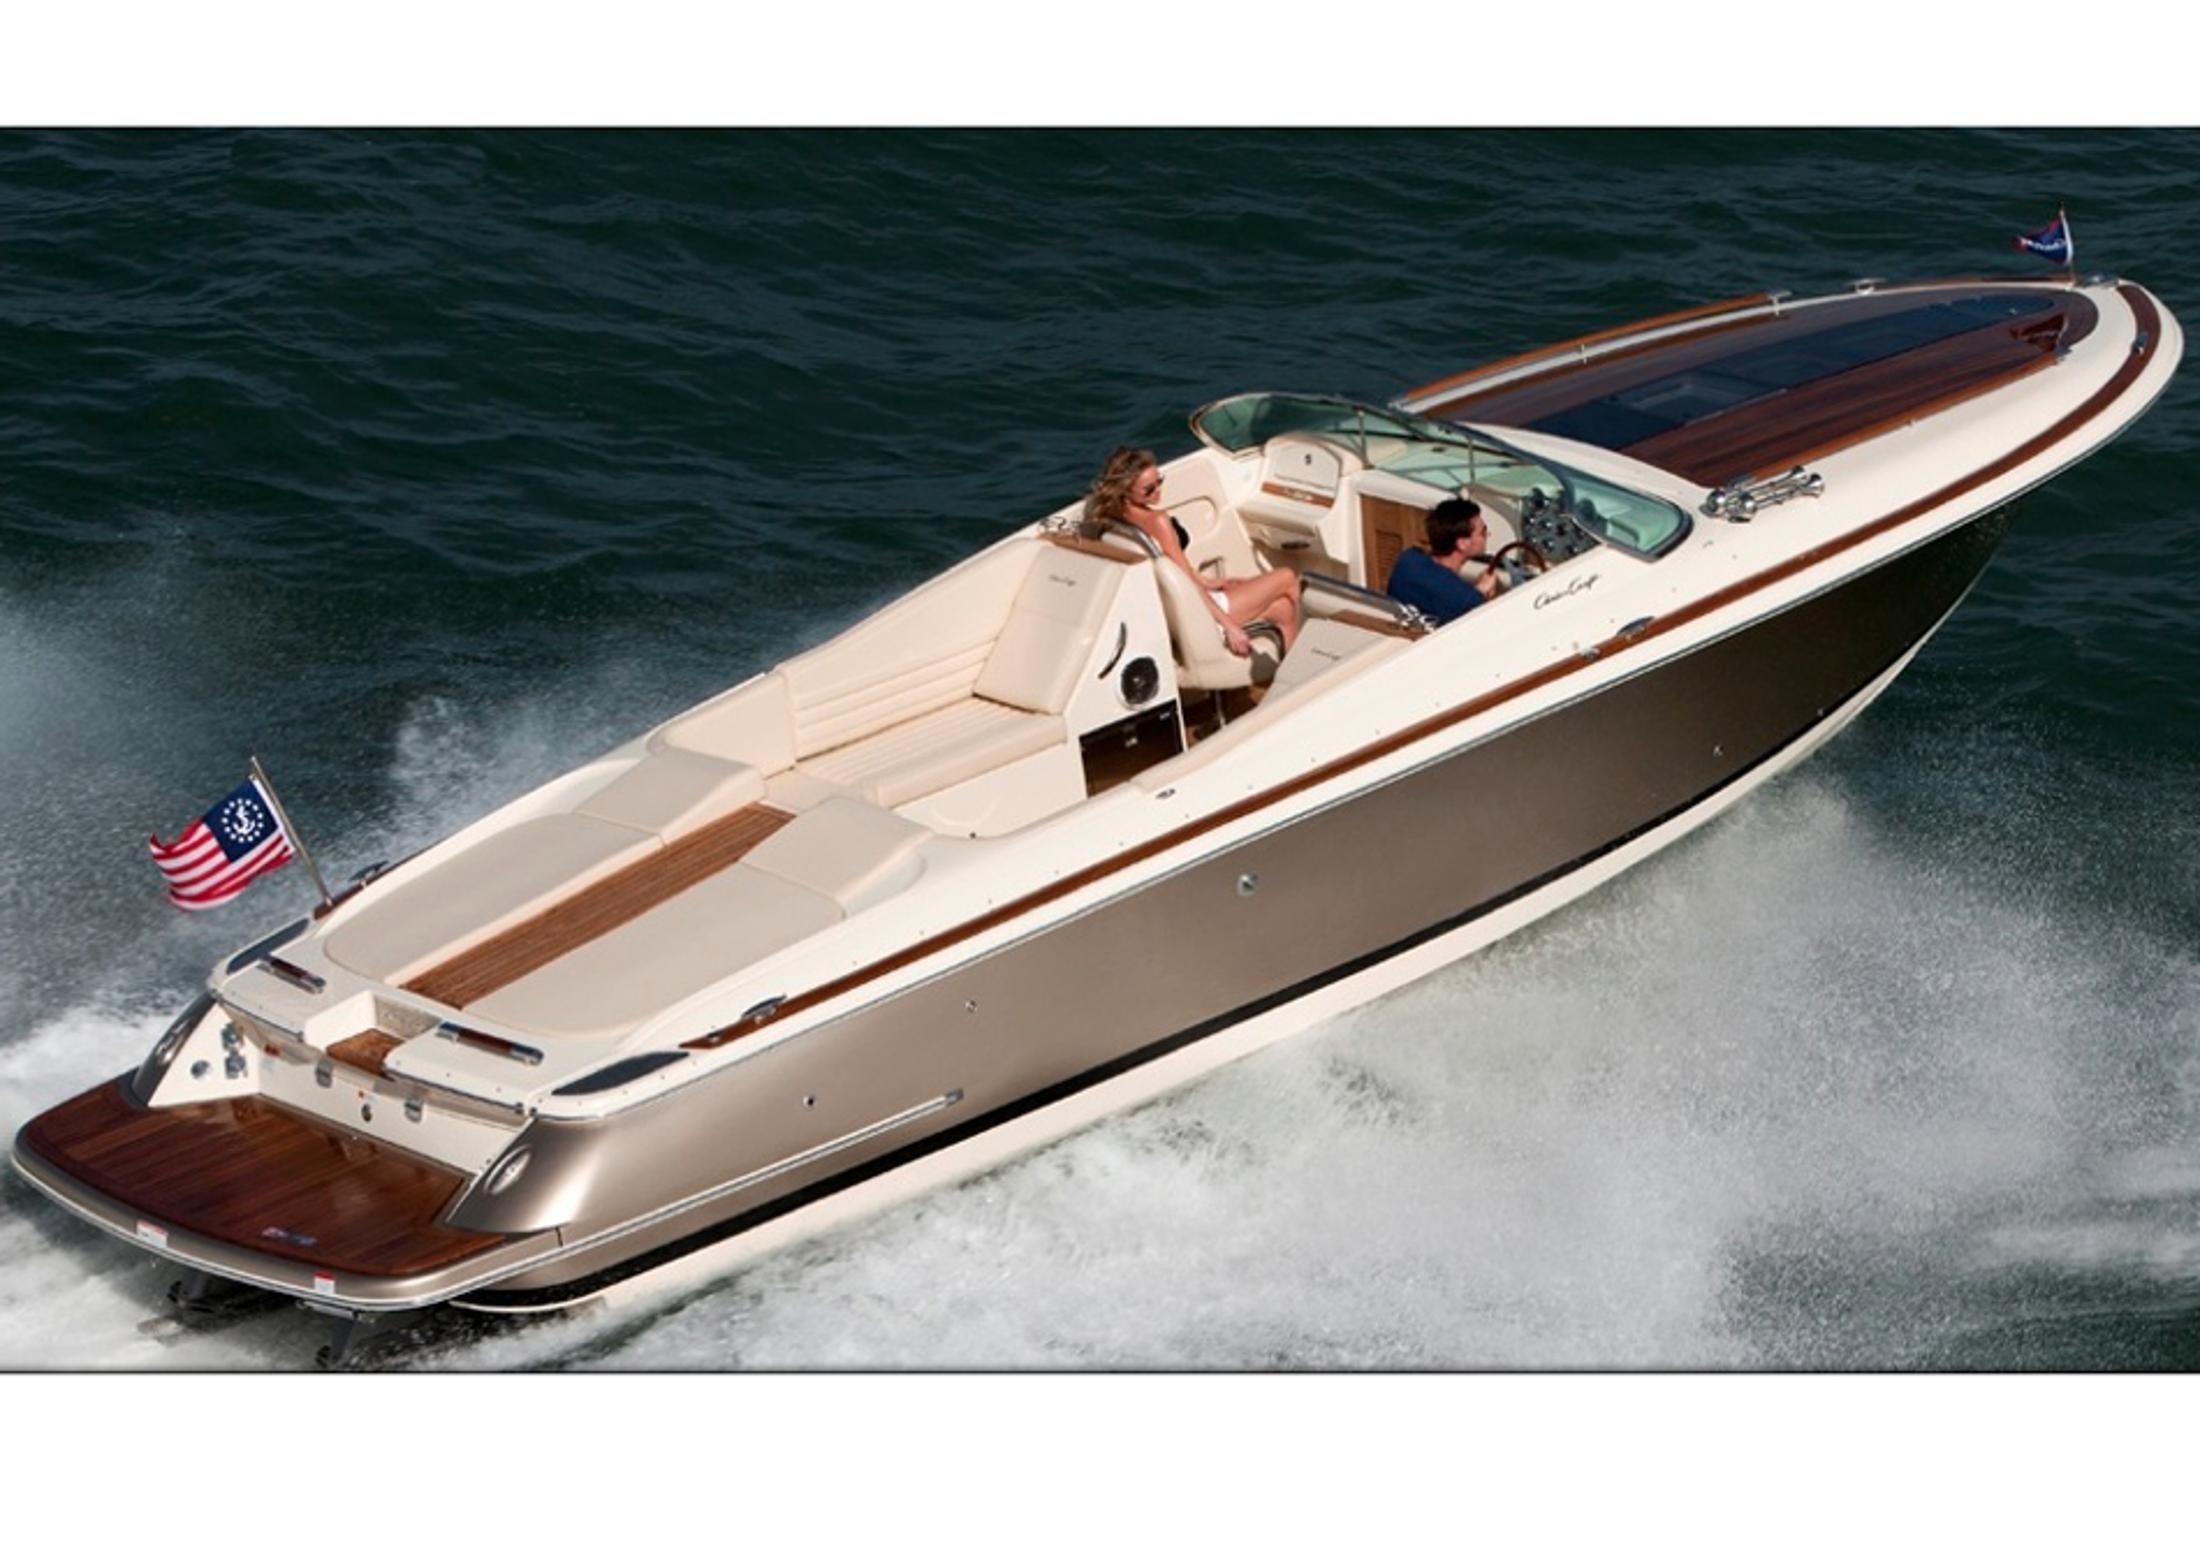 2018 chris craft corsair 32 heritage edition power boat On chris craft corsair 32 for sale